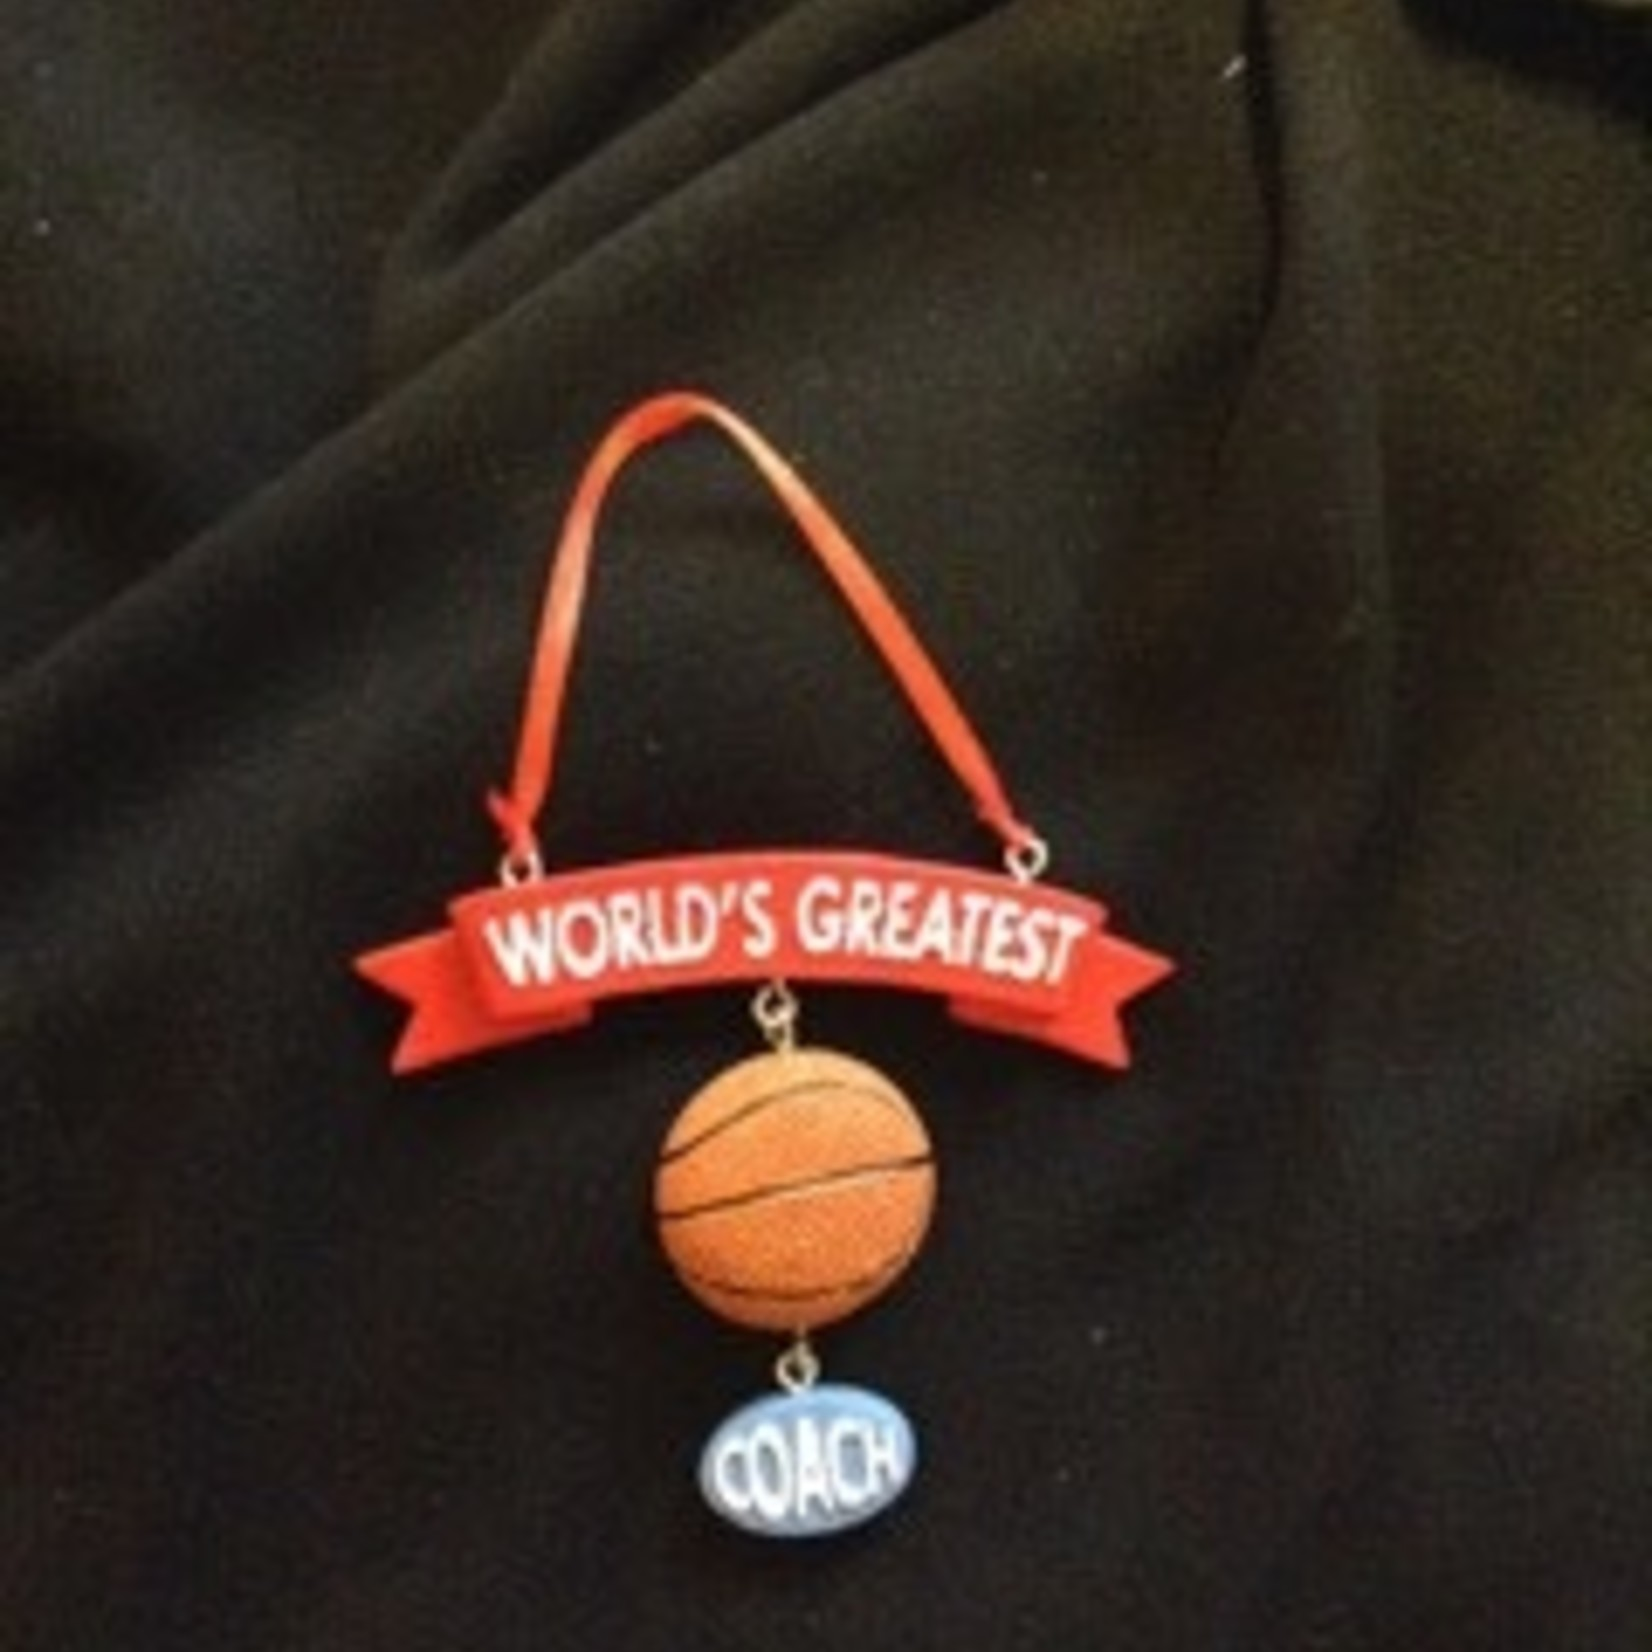 **World's Greatest Coach Orn - Basketball